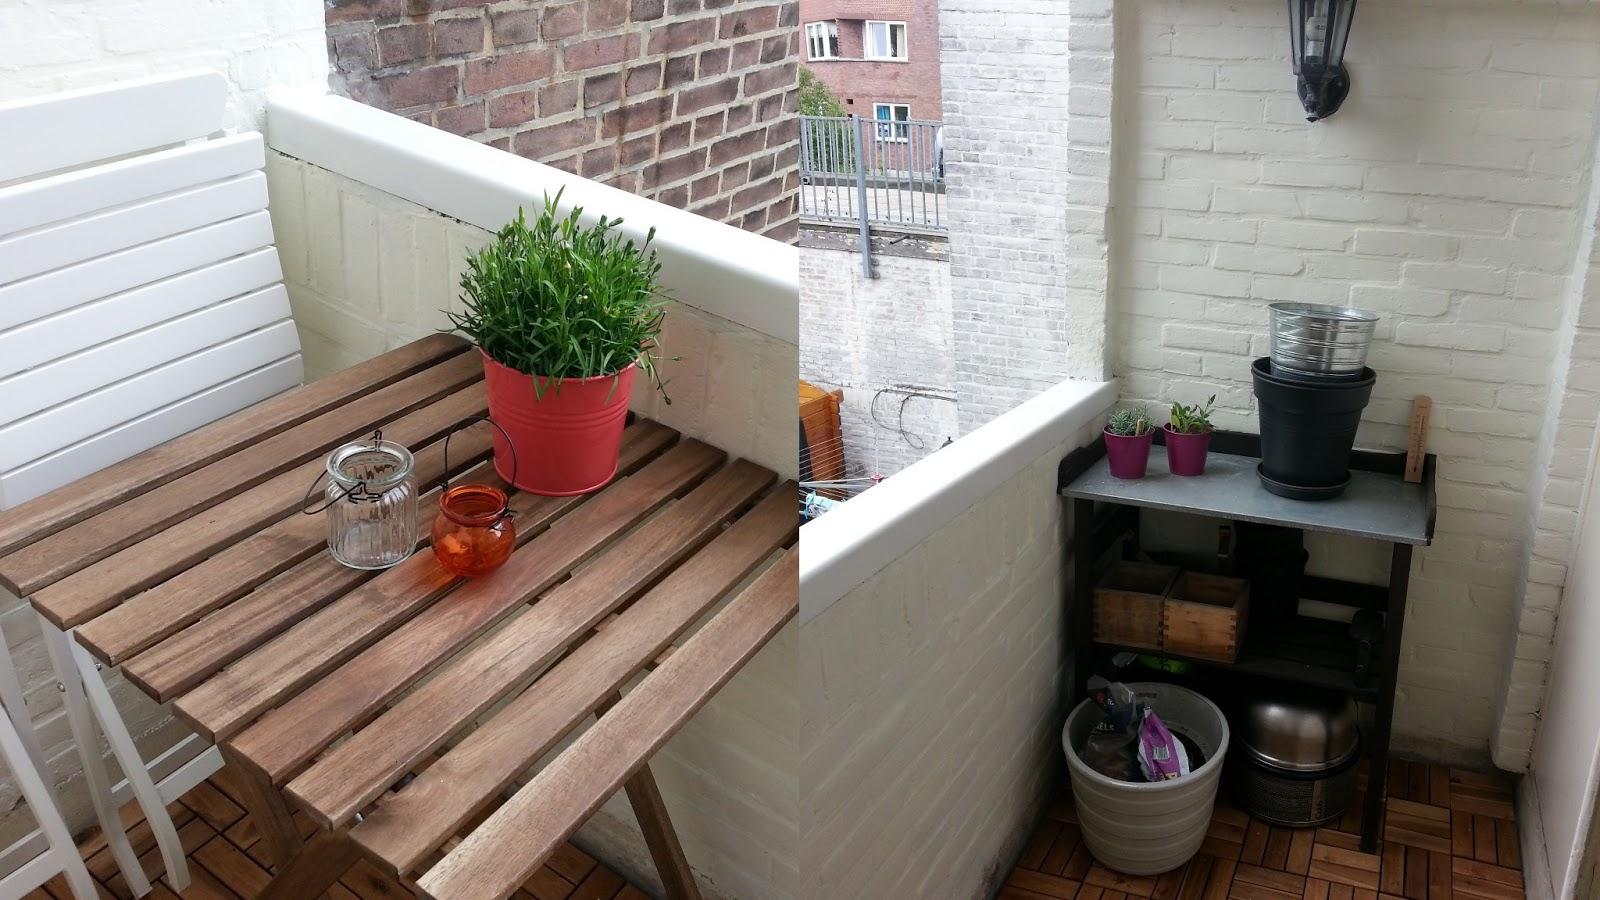 Dutchland homemade: juni 2013